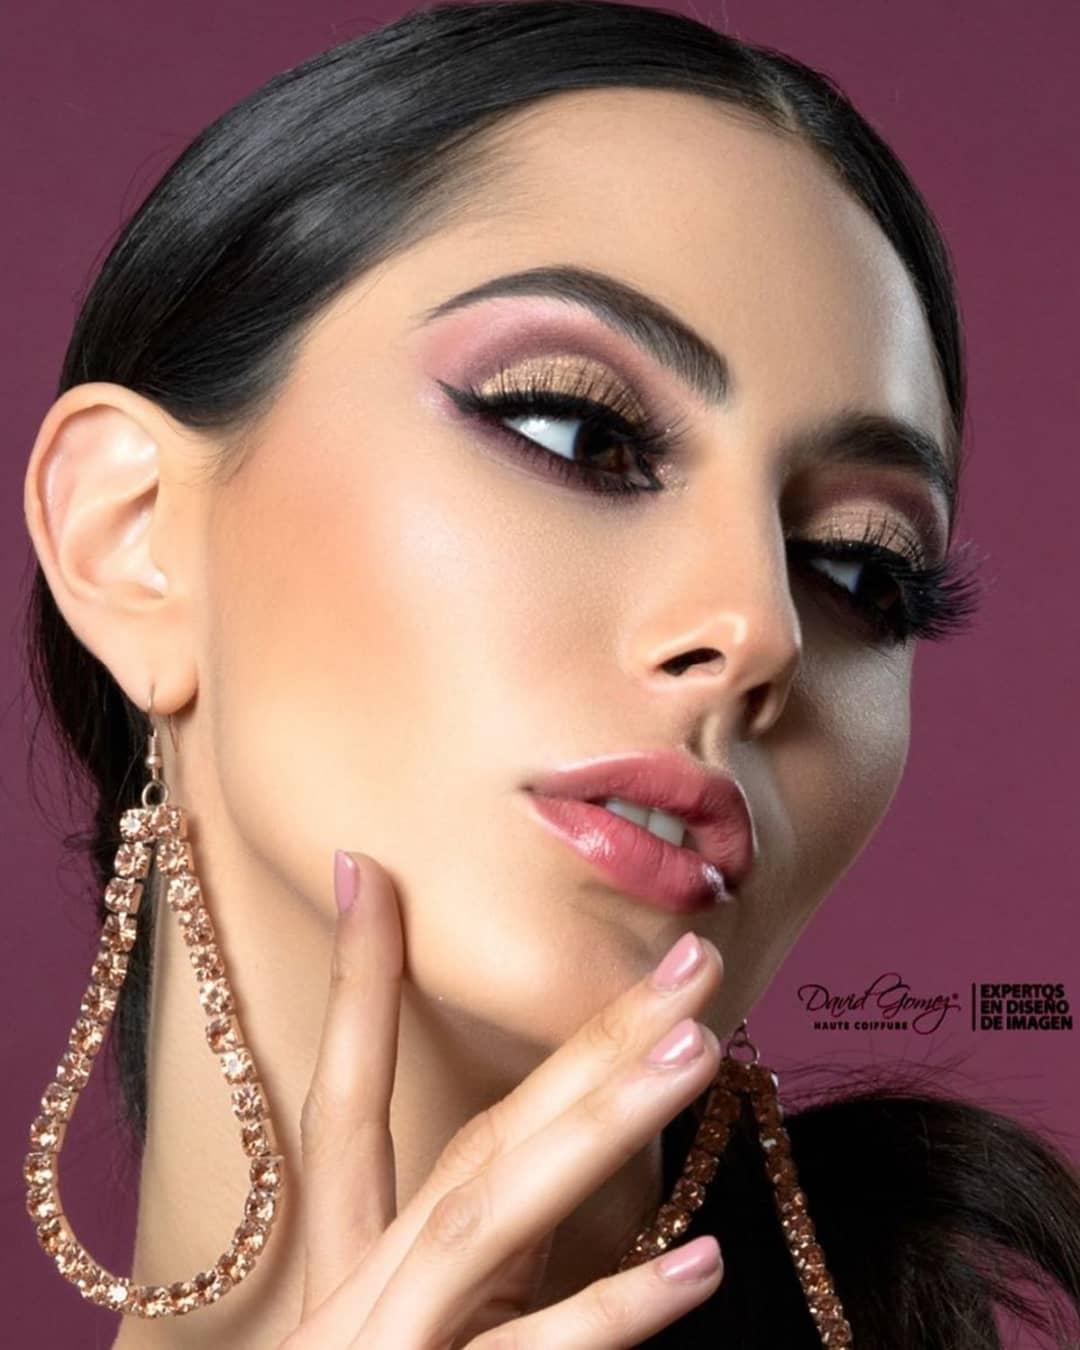 maria malo, 1st runner-up de miss grand international 2019. - Página 6 66819010